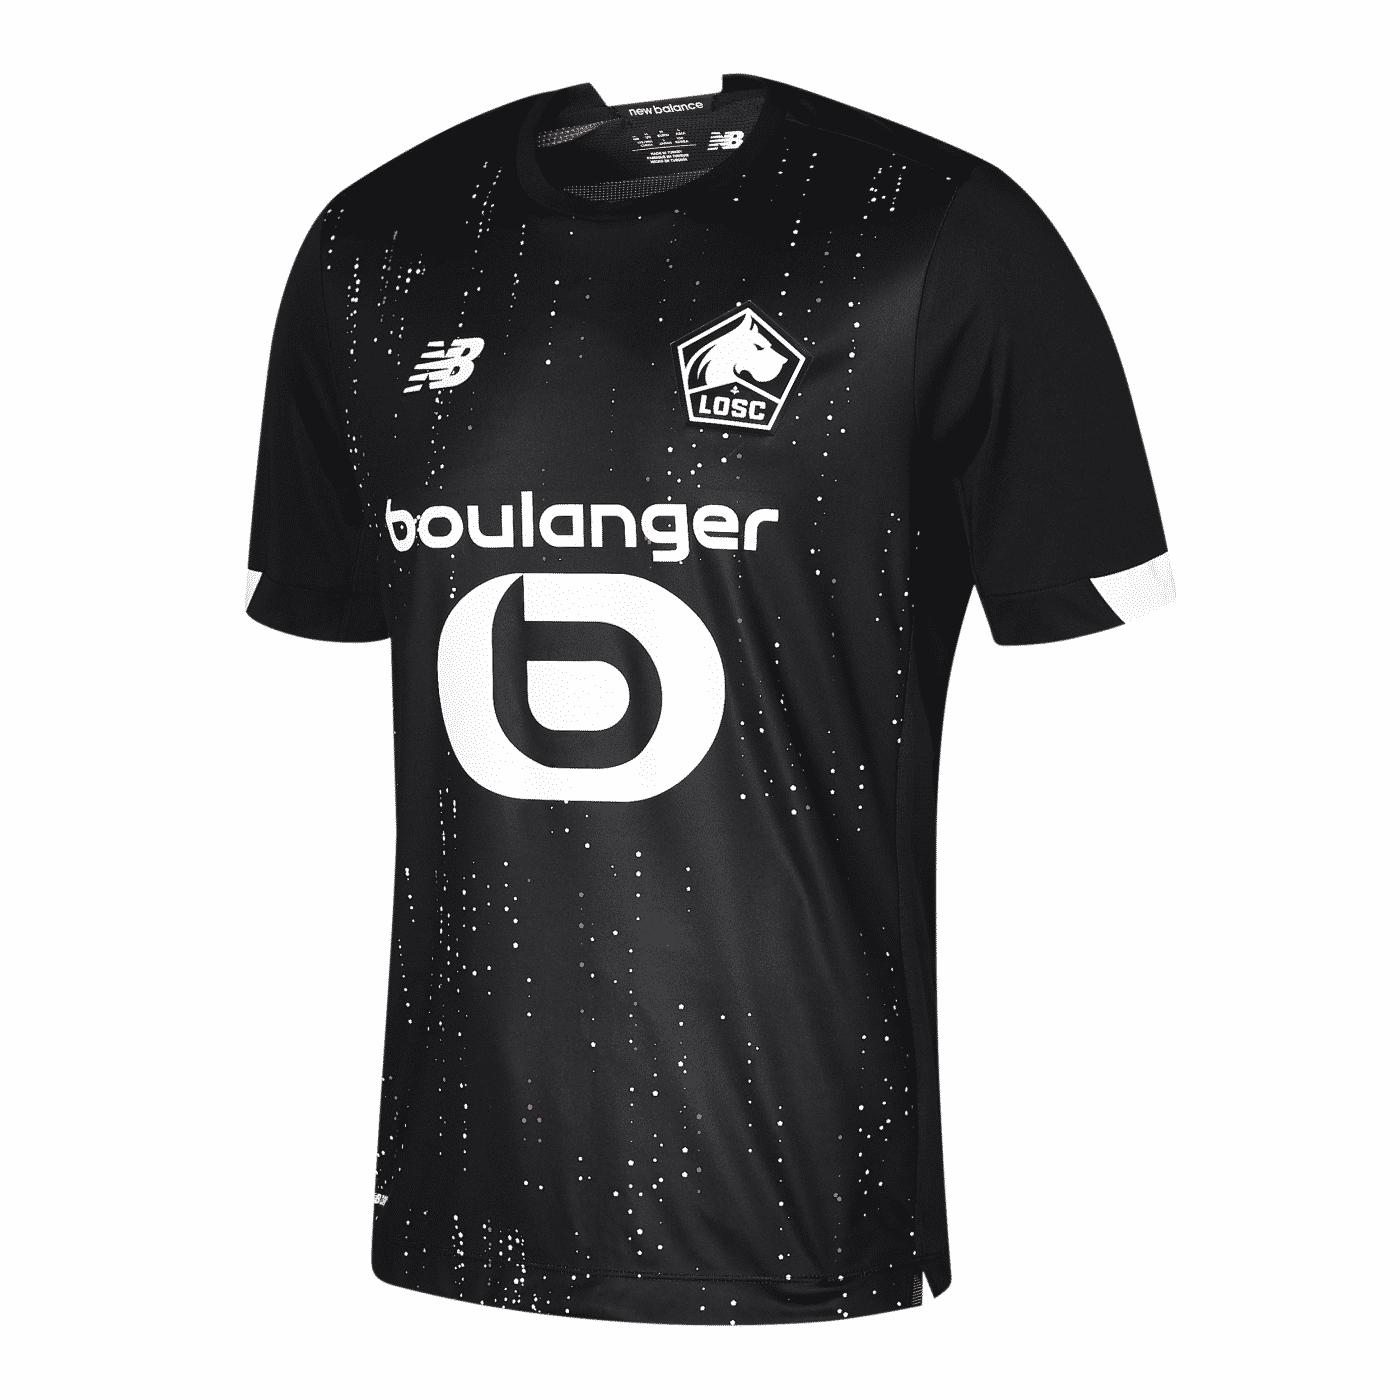 maillot-exterieur-lille-losc-2020-2021-new-balance